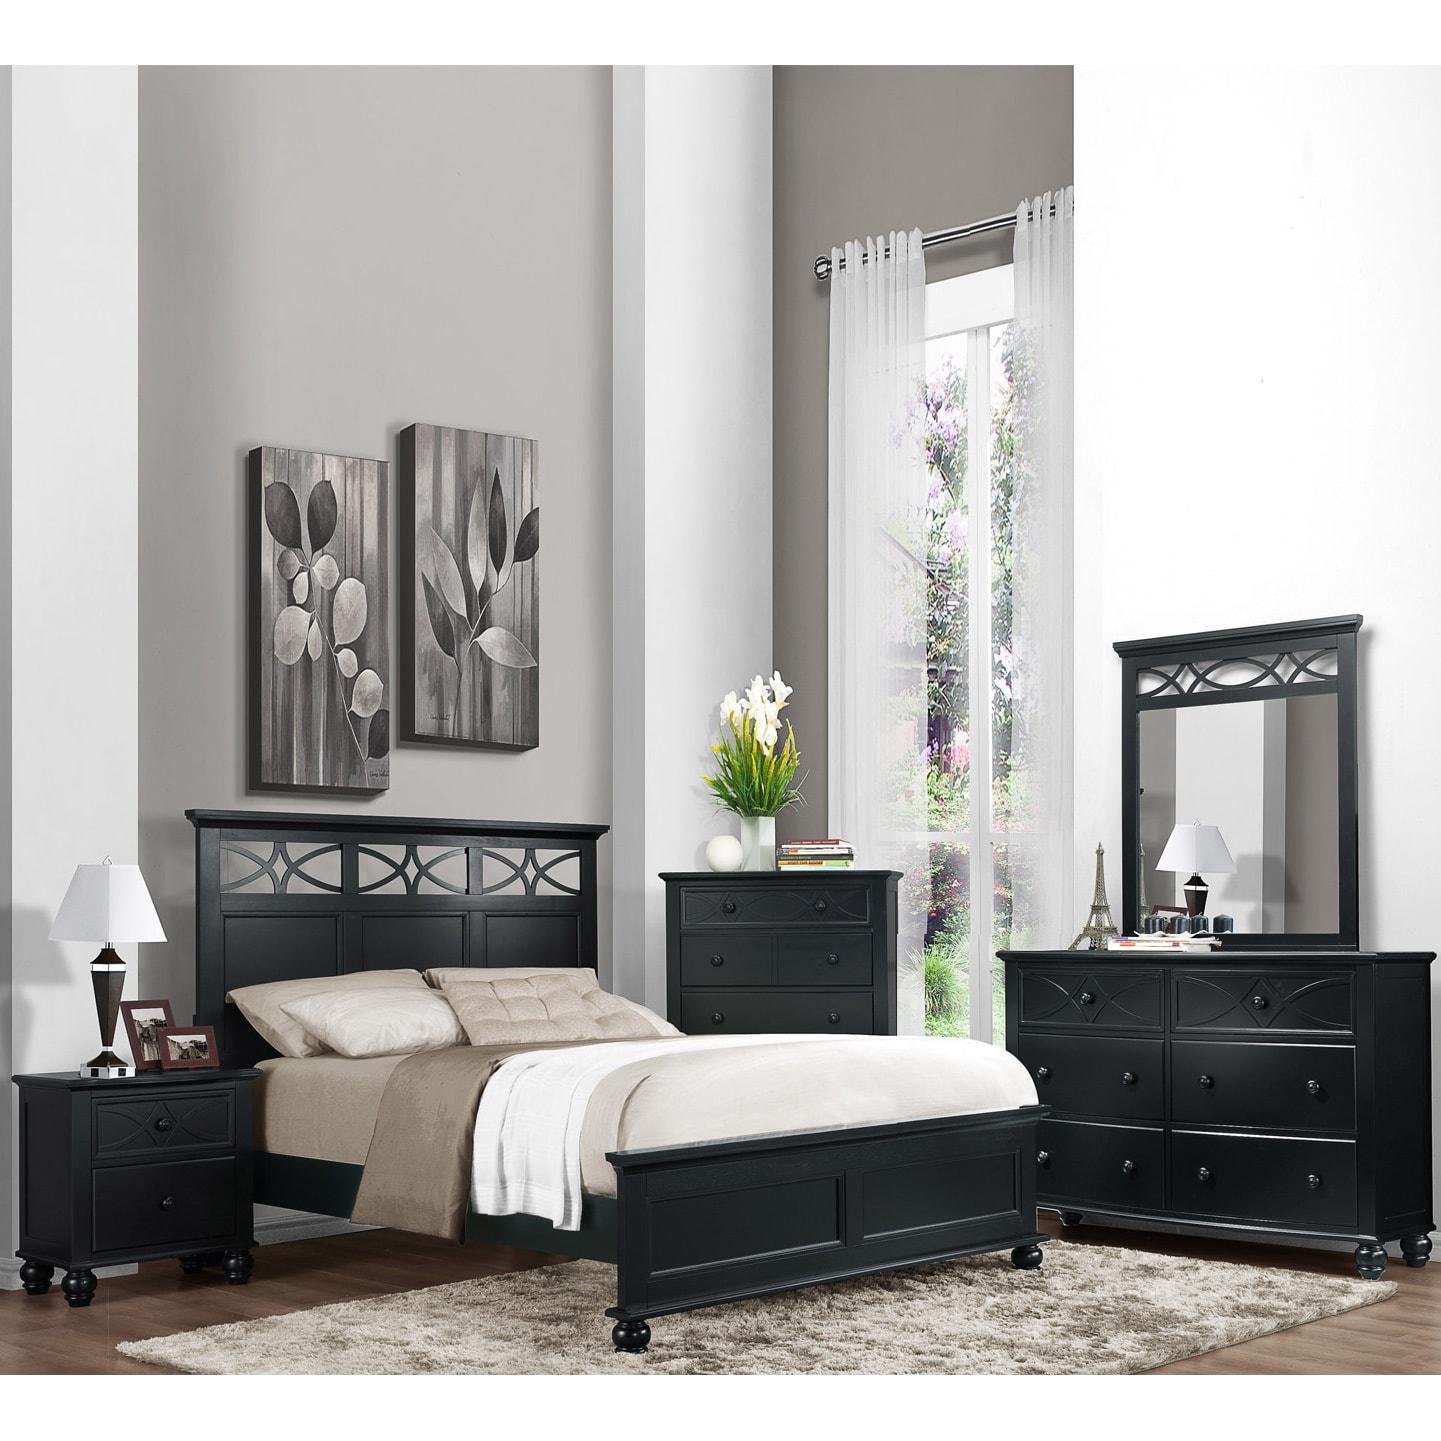 Shop tribecca home piston 5 piece black rubberwood bedroom free shipping today overstock com 6799863